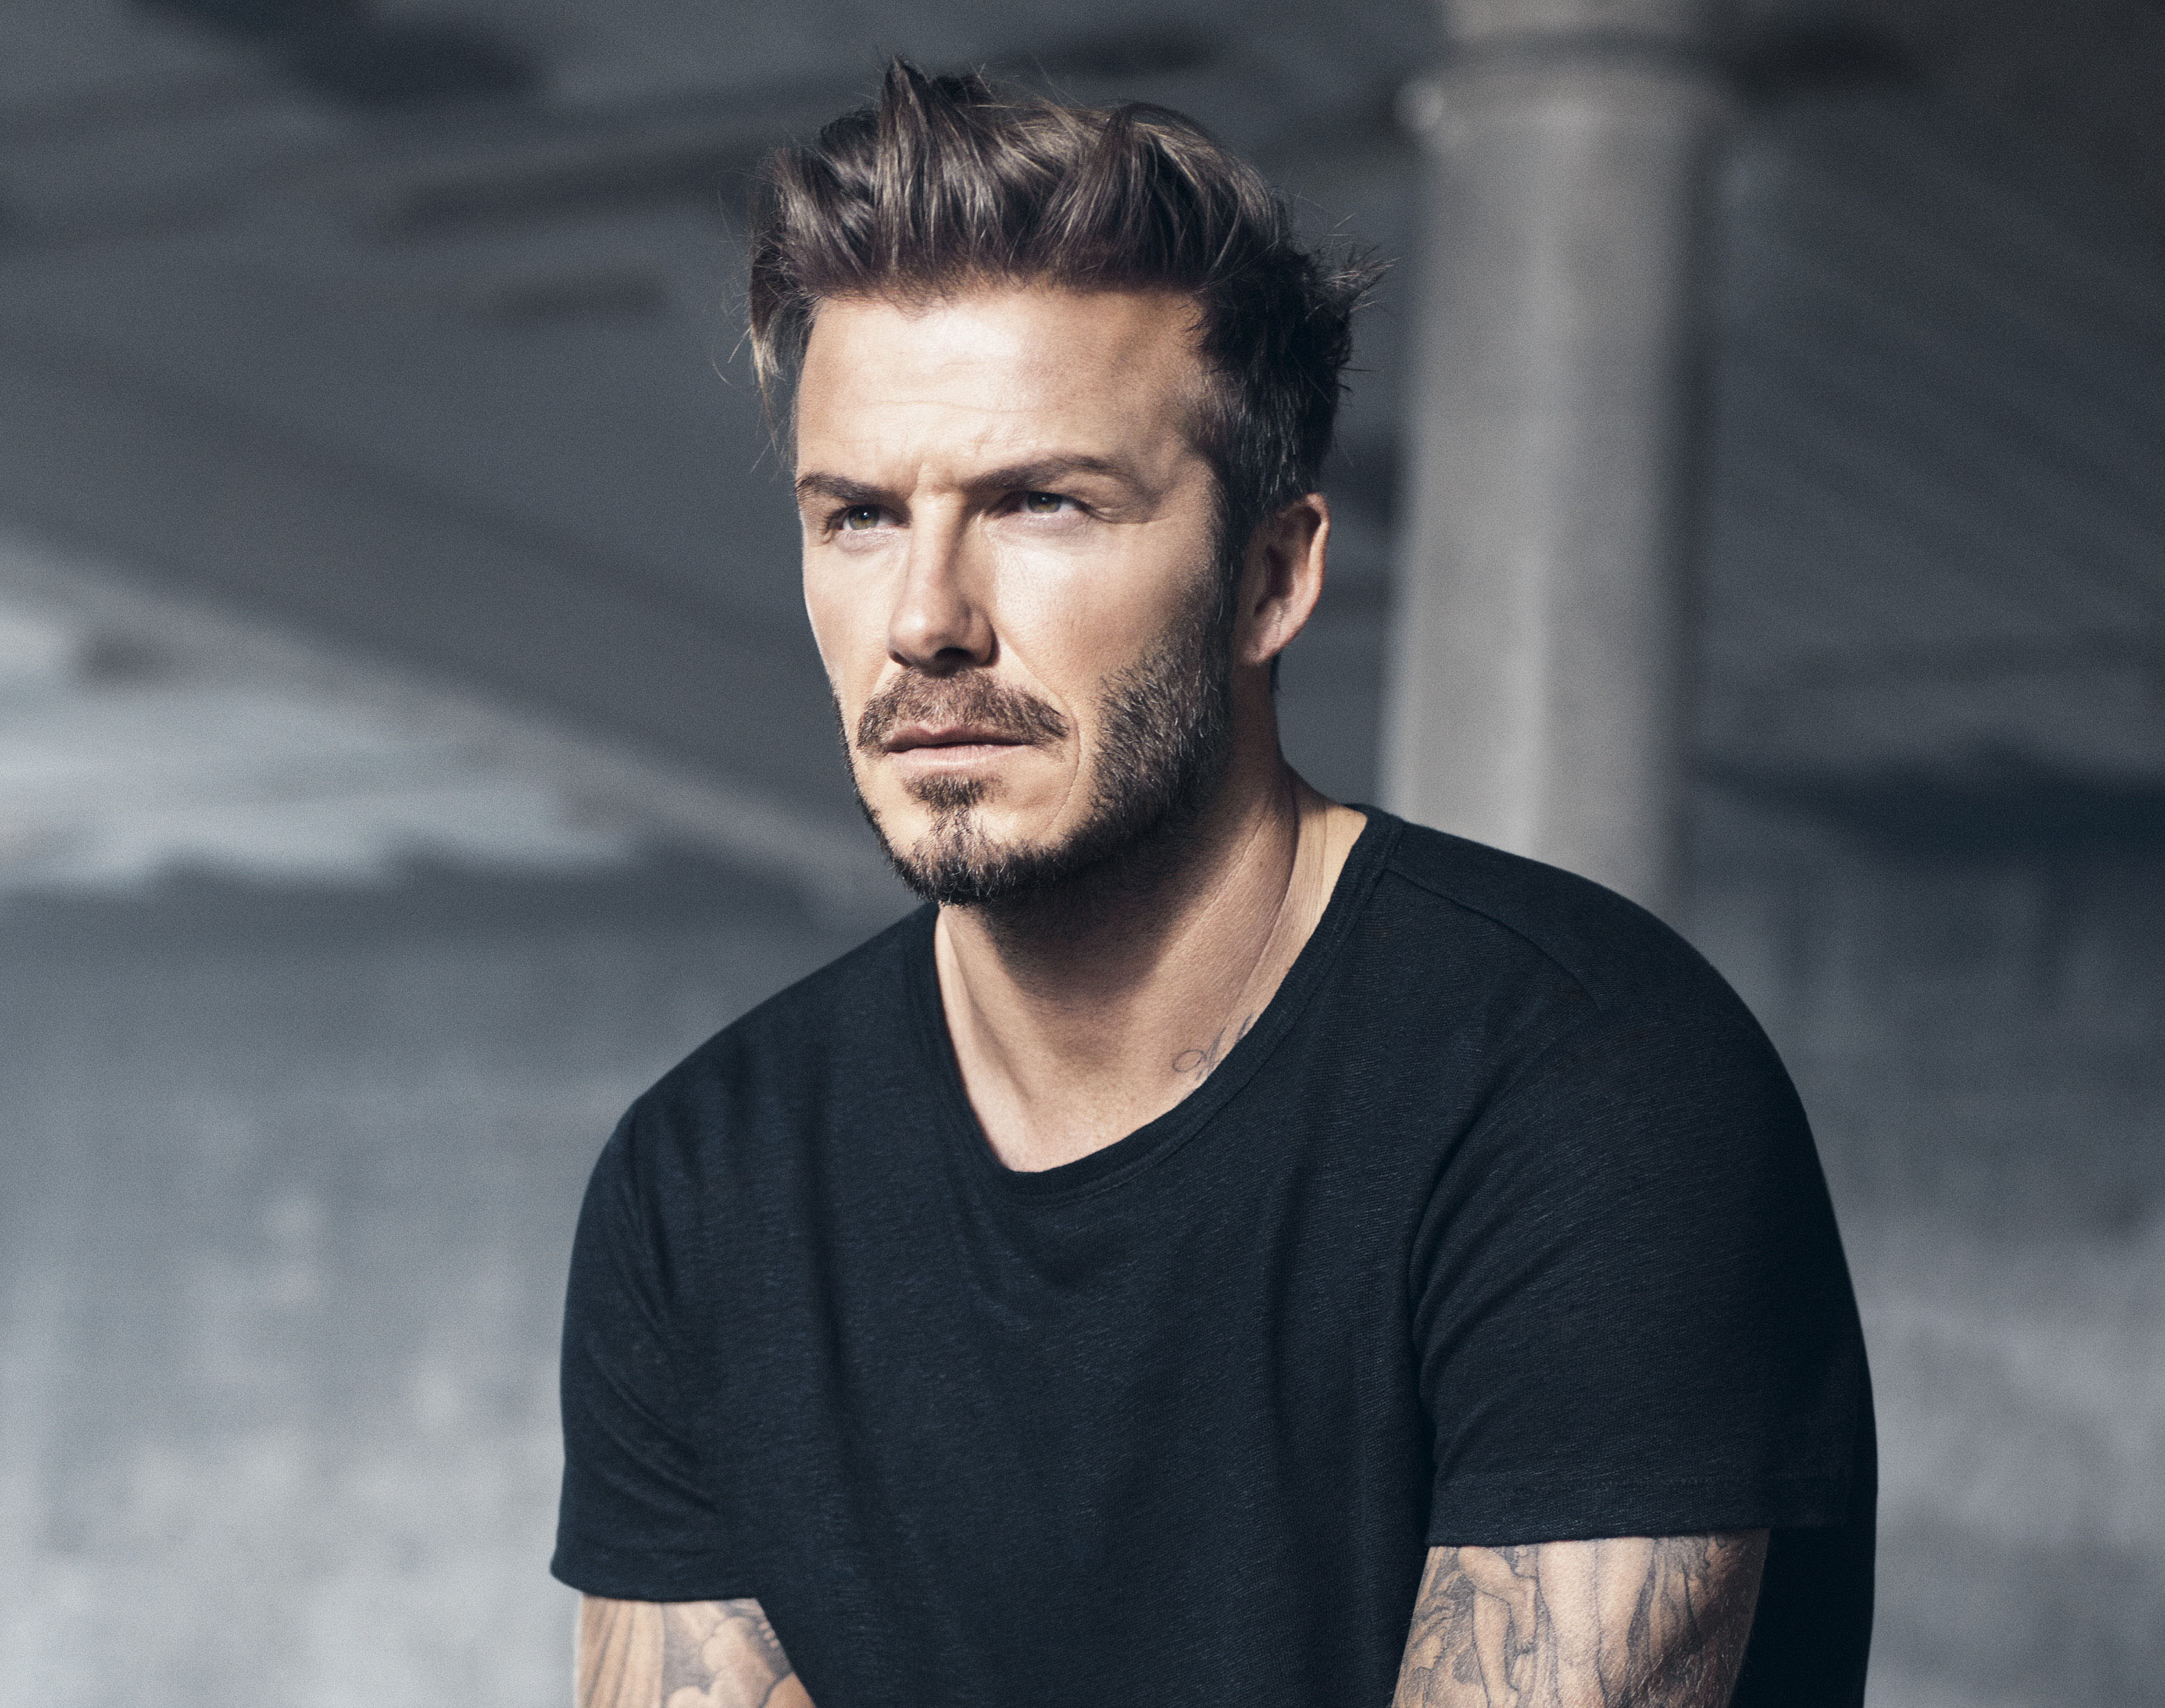 David Beckham 2018 Hd Celebrities 4k Wallpapers Images